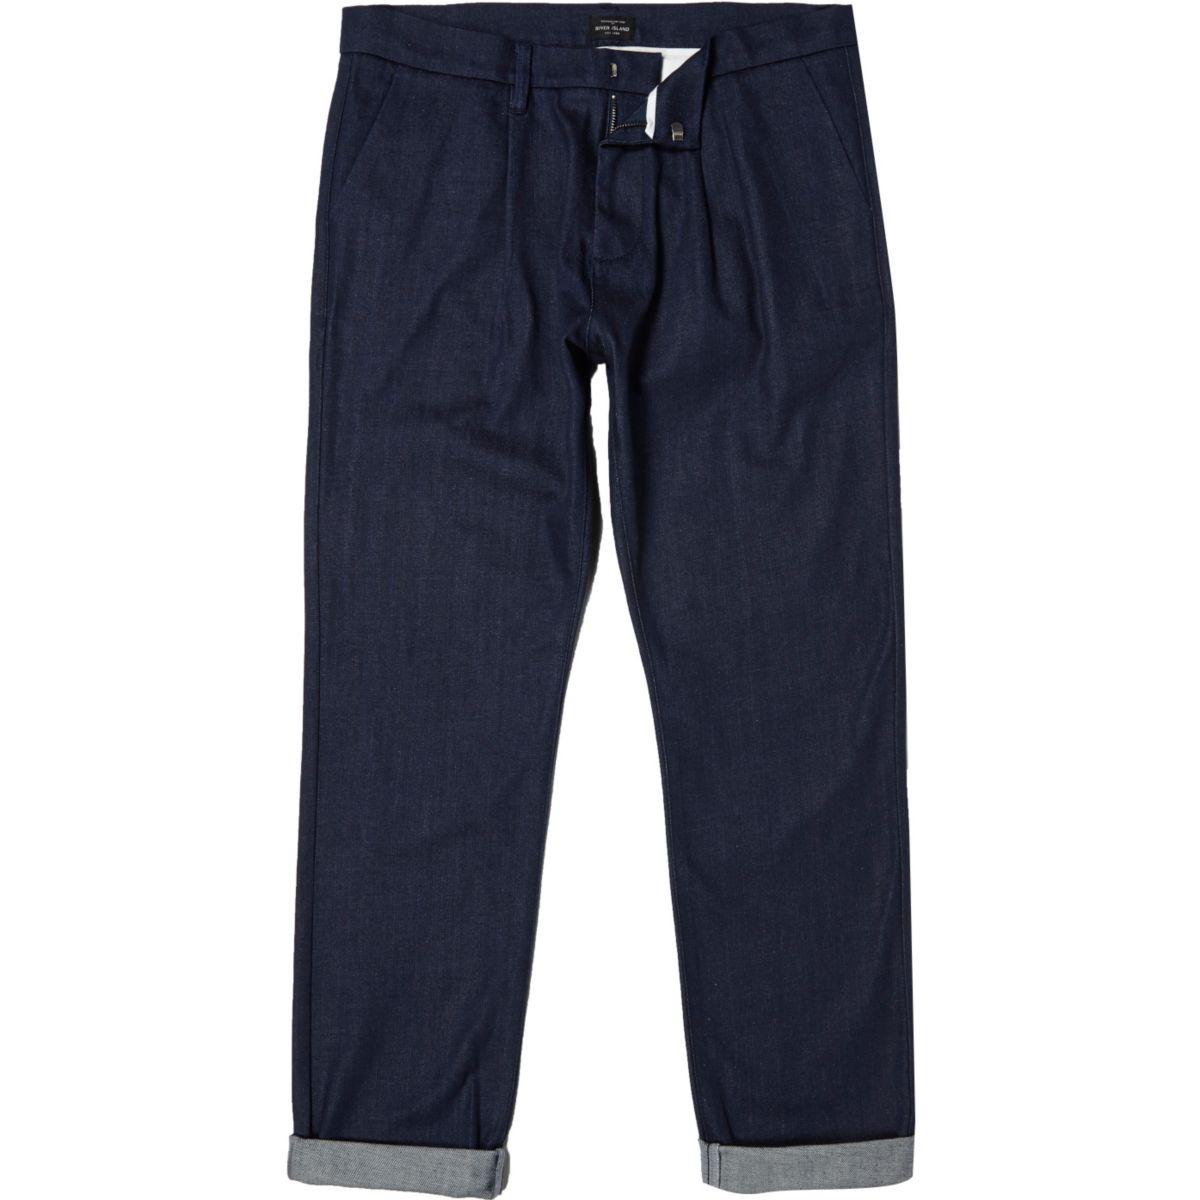 Dark blue tailored denim pants